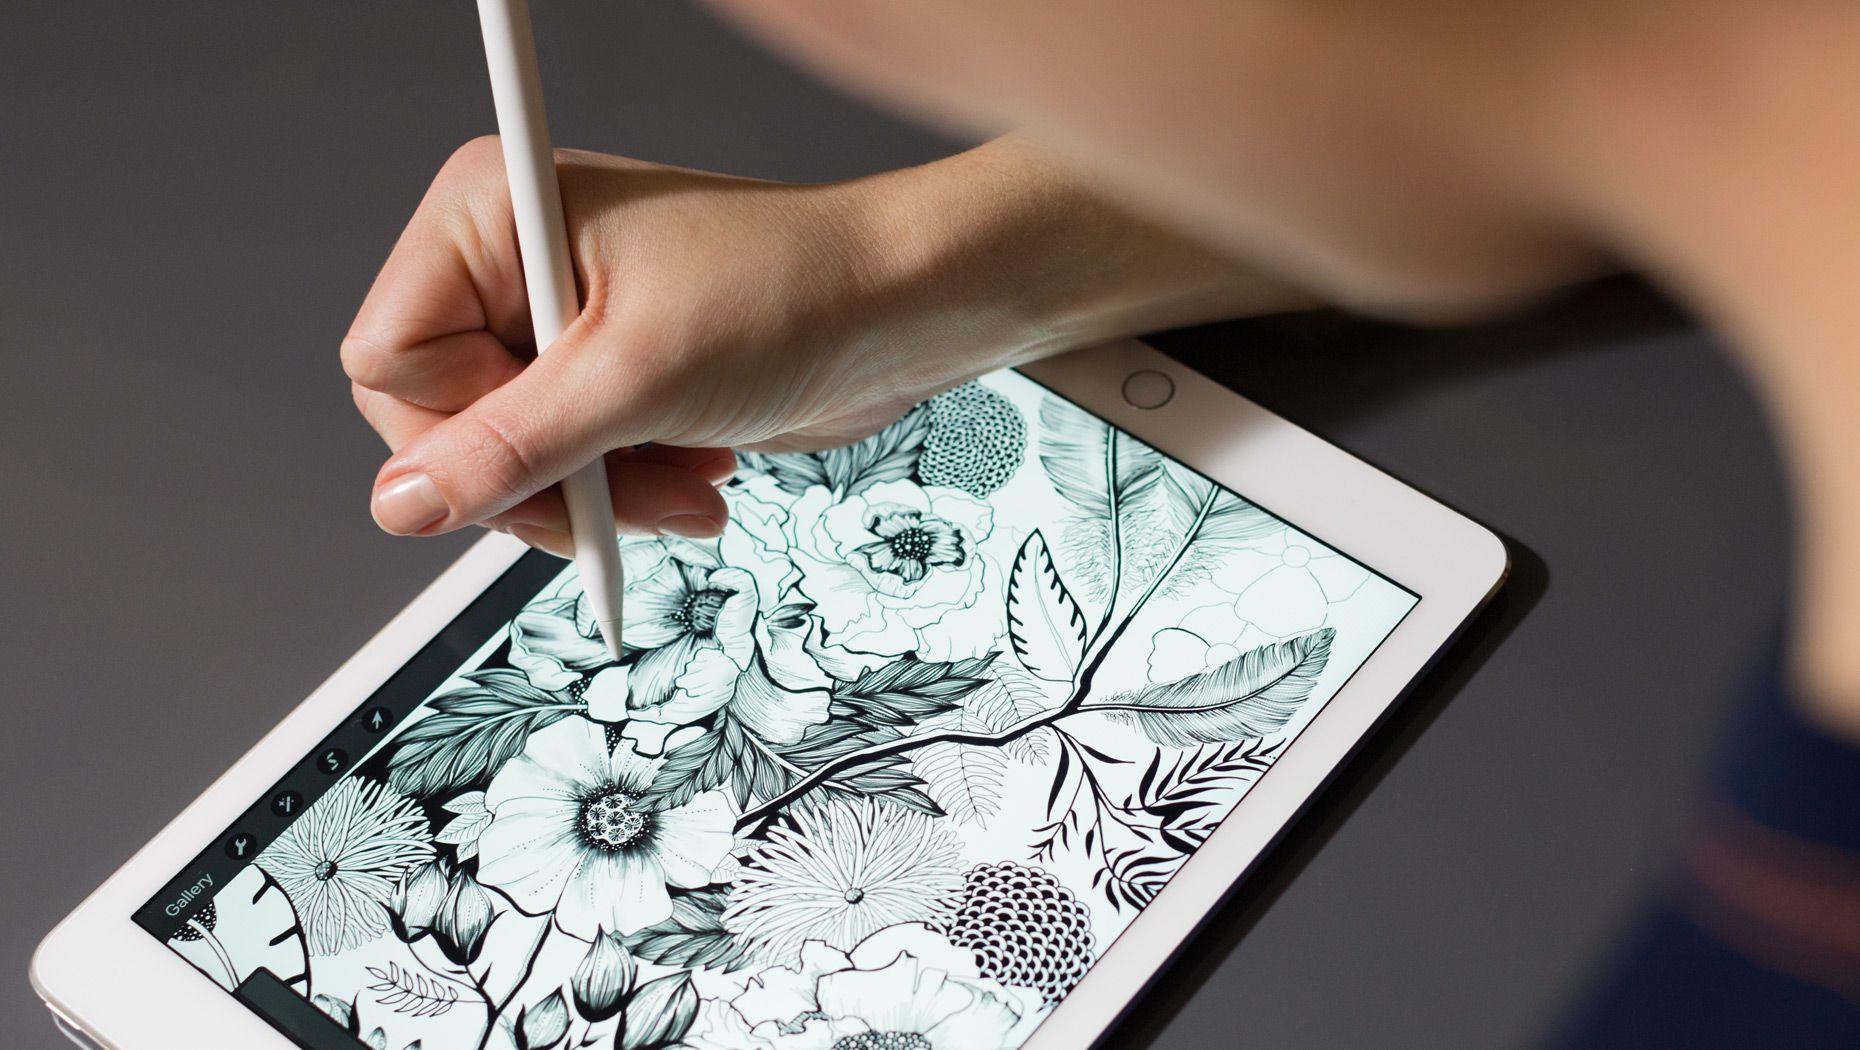 Ipad pro 12 9 ipad drawing app ipad pro apps ipad pro 12